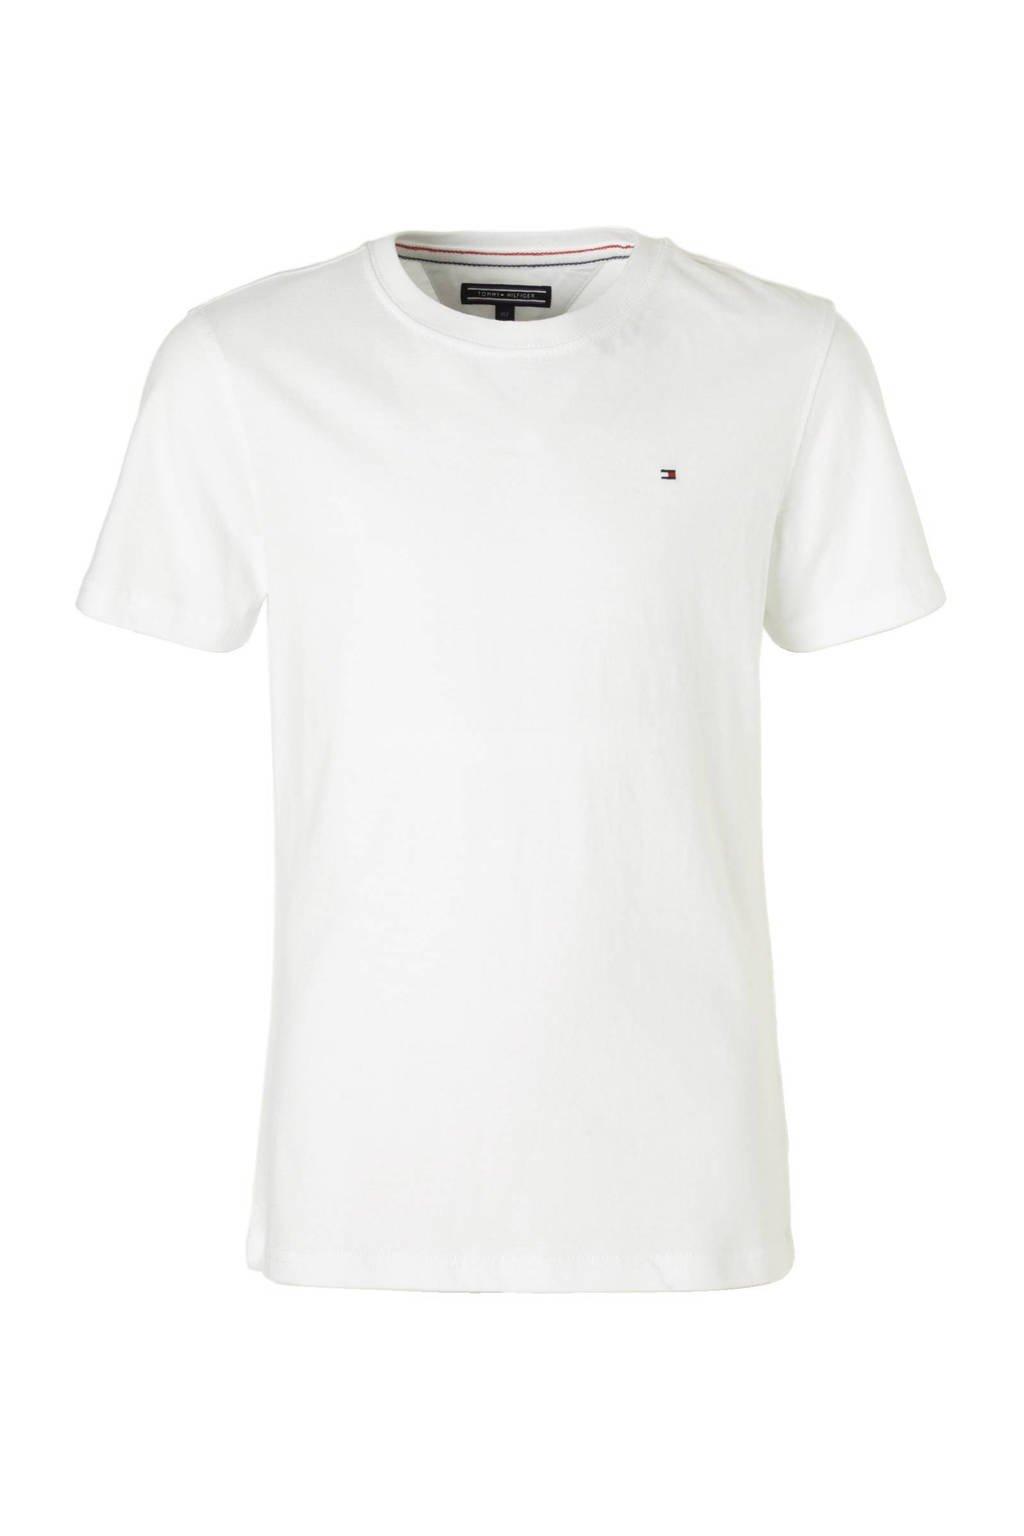 Tommy Hilfiger T-shirt, Wit